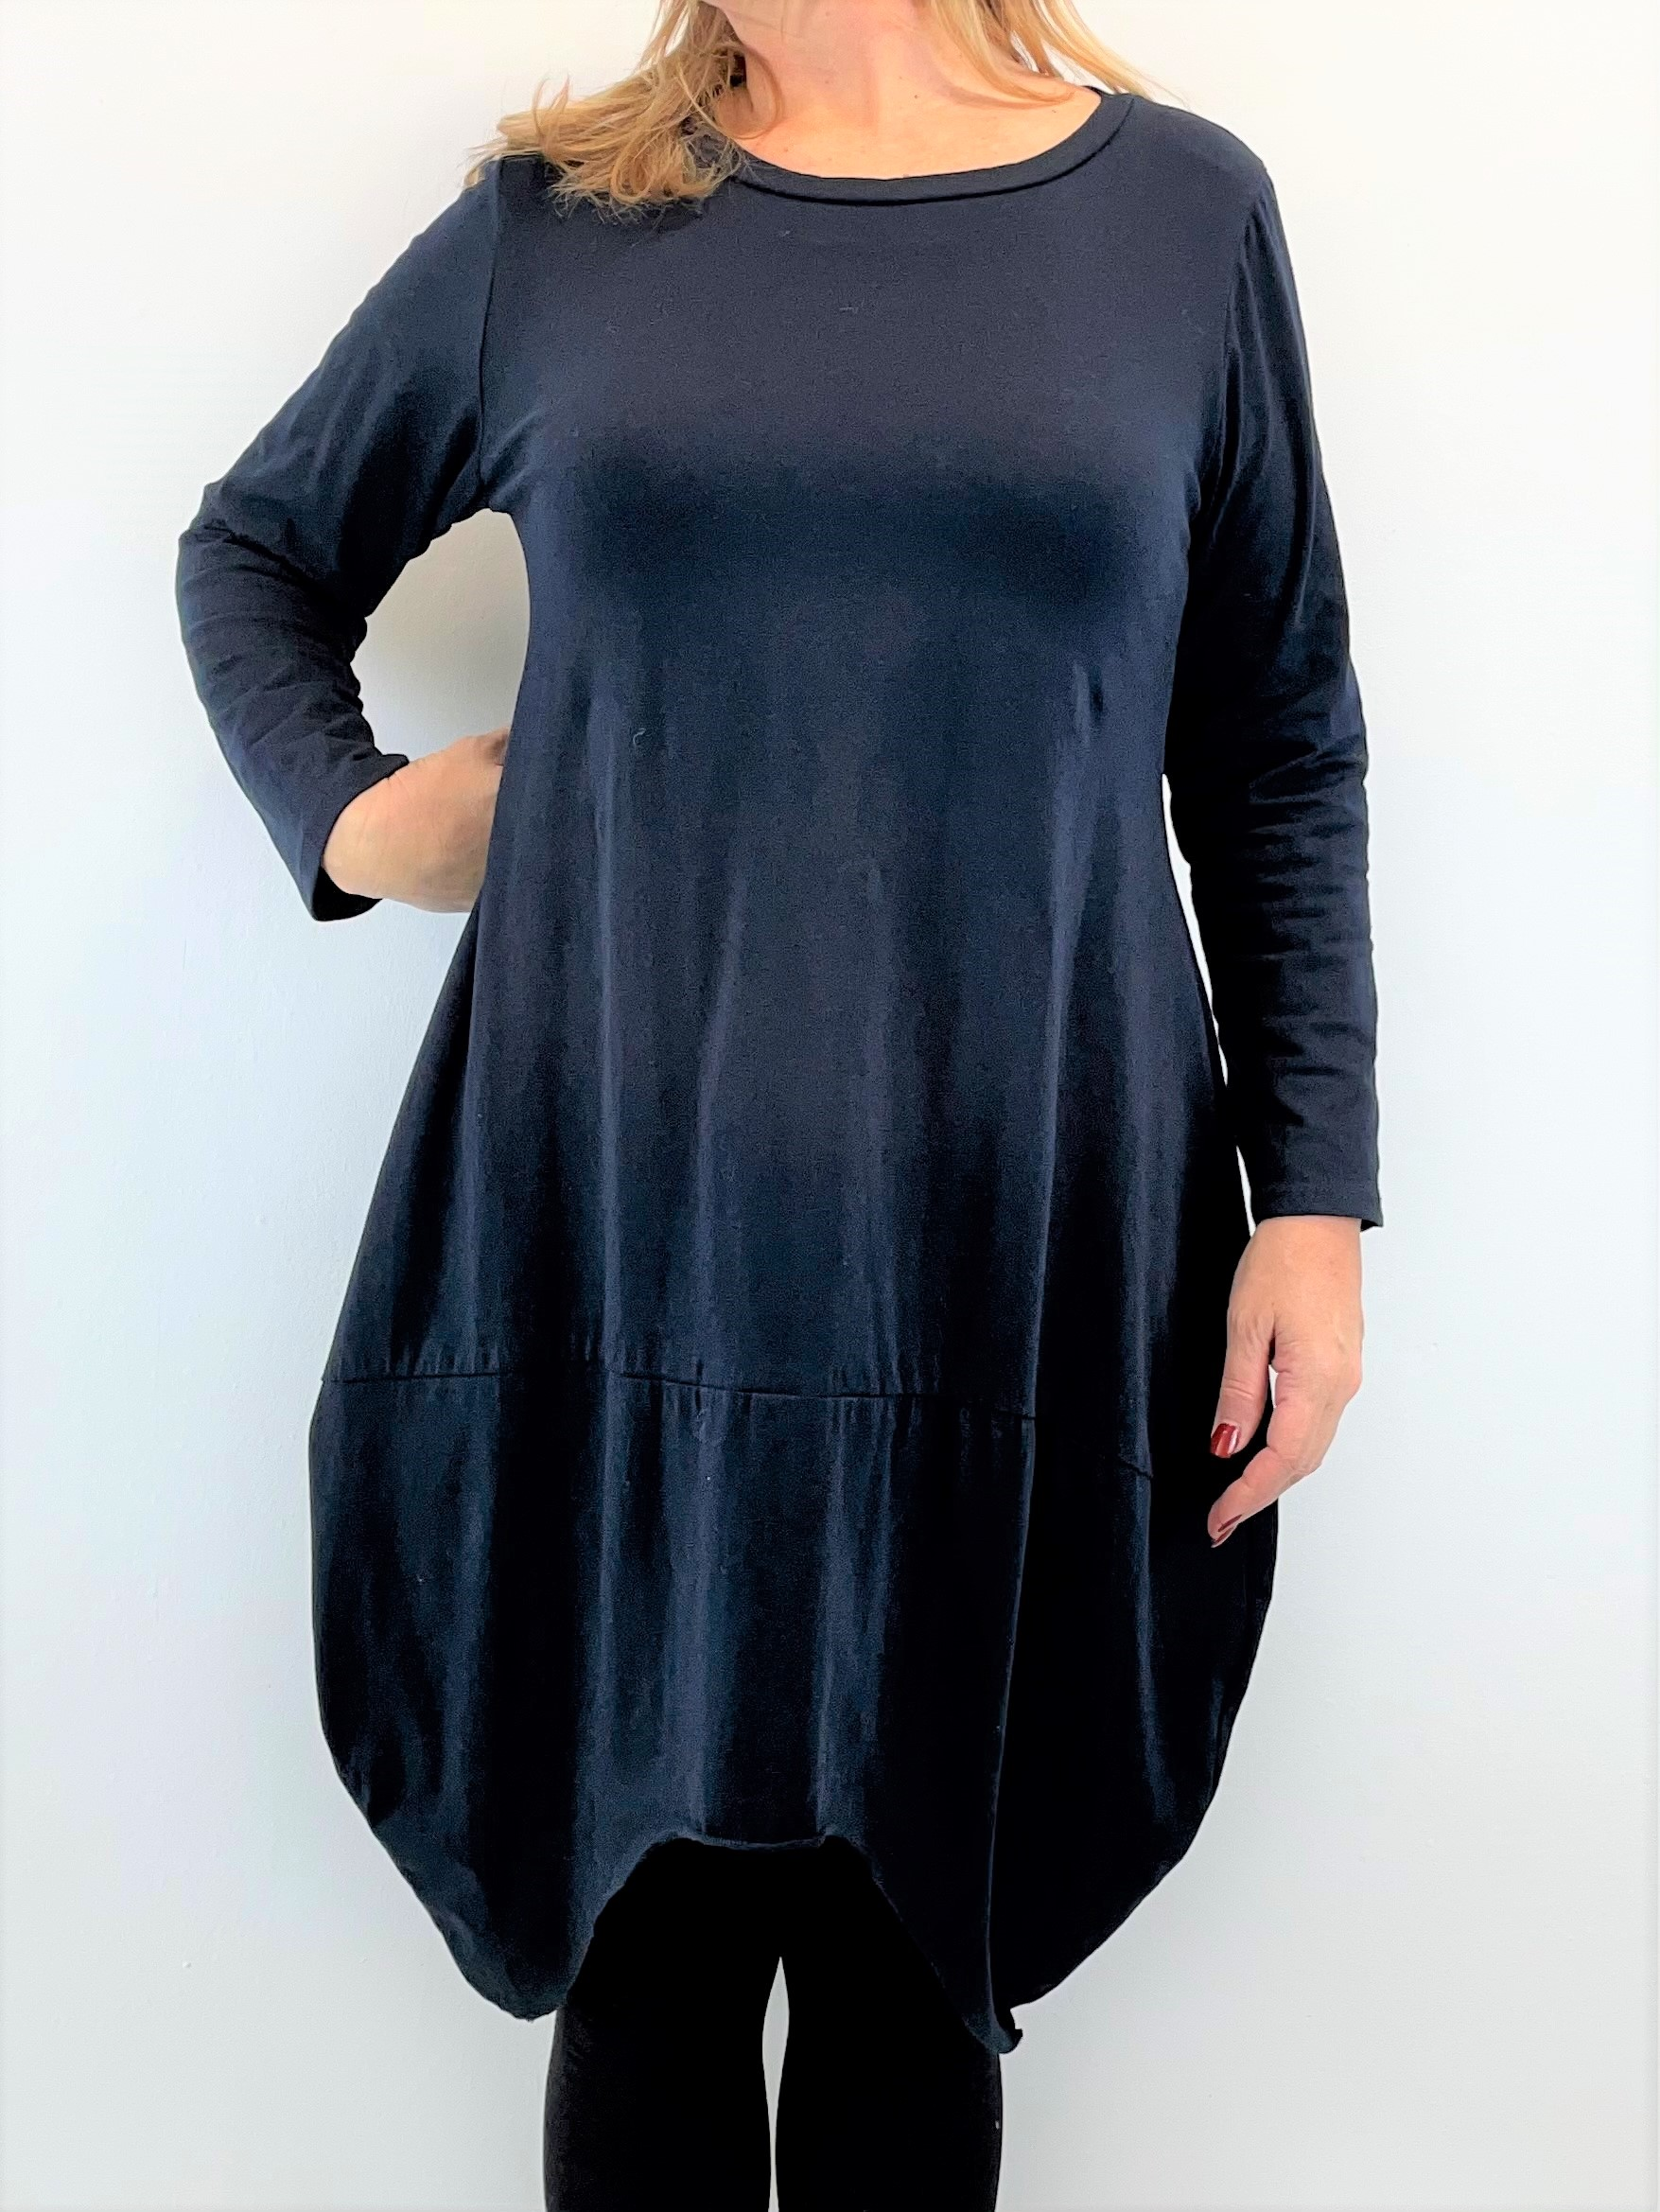 Egg Shape Kleid in Jersey Qualität